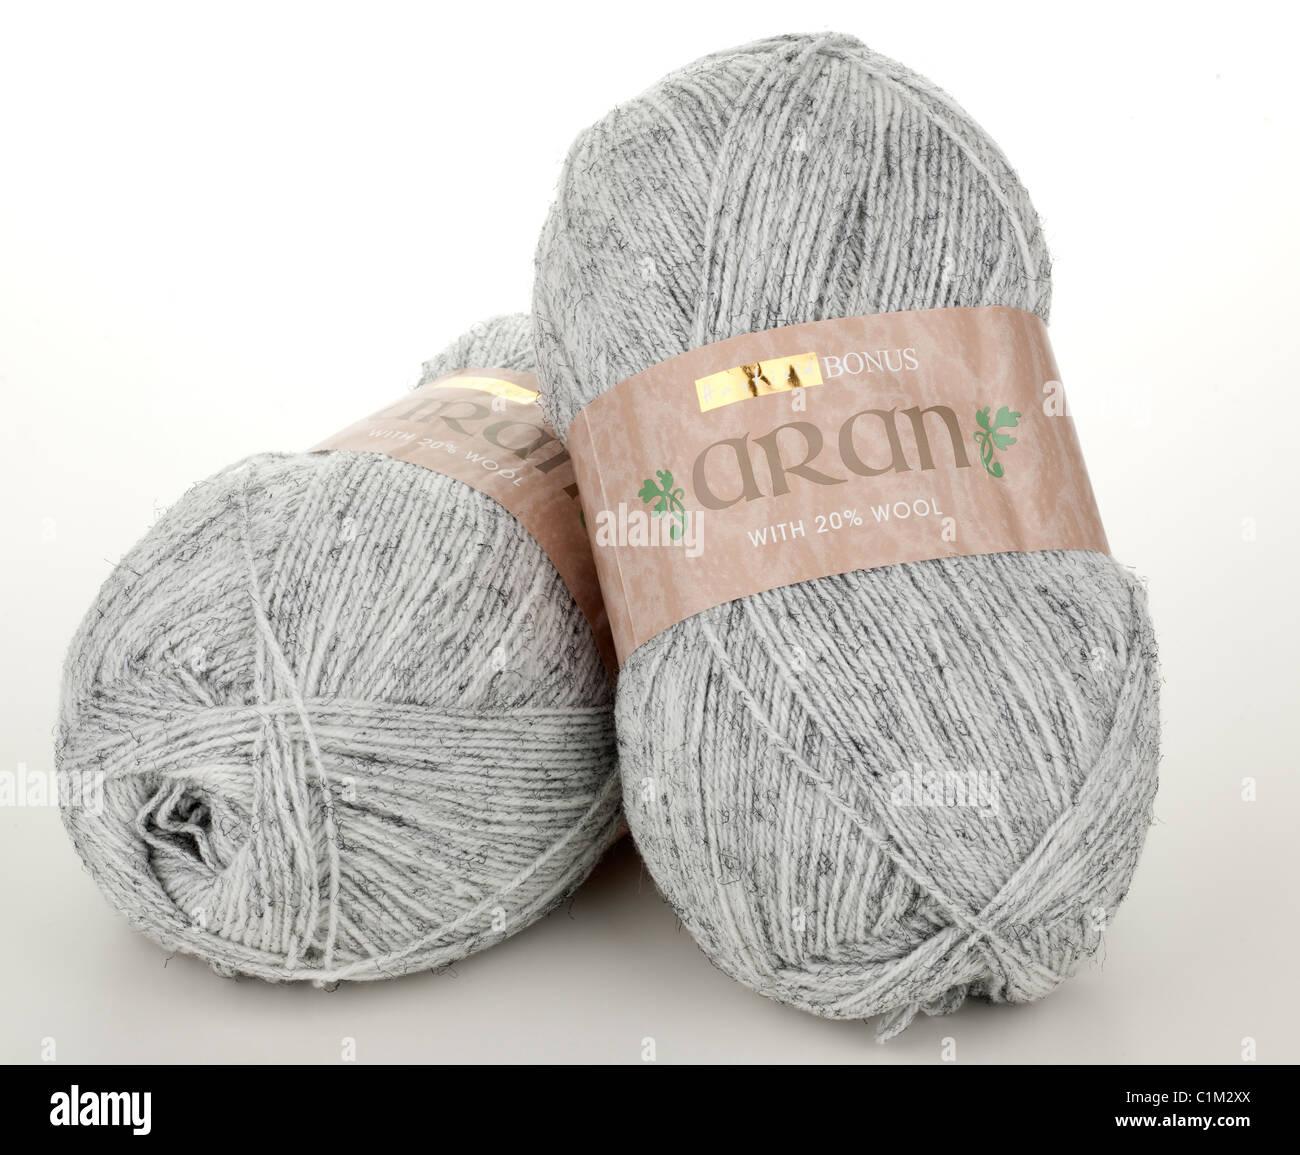 Two 400 gram balls of Hayfield Aran grey wool - Stock Image